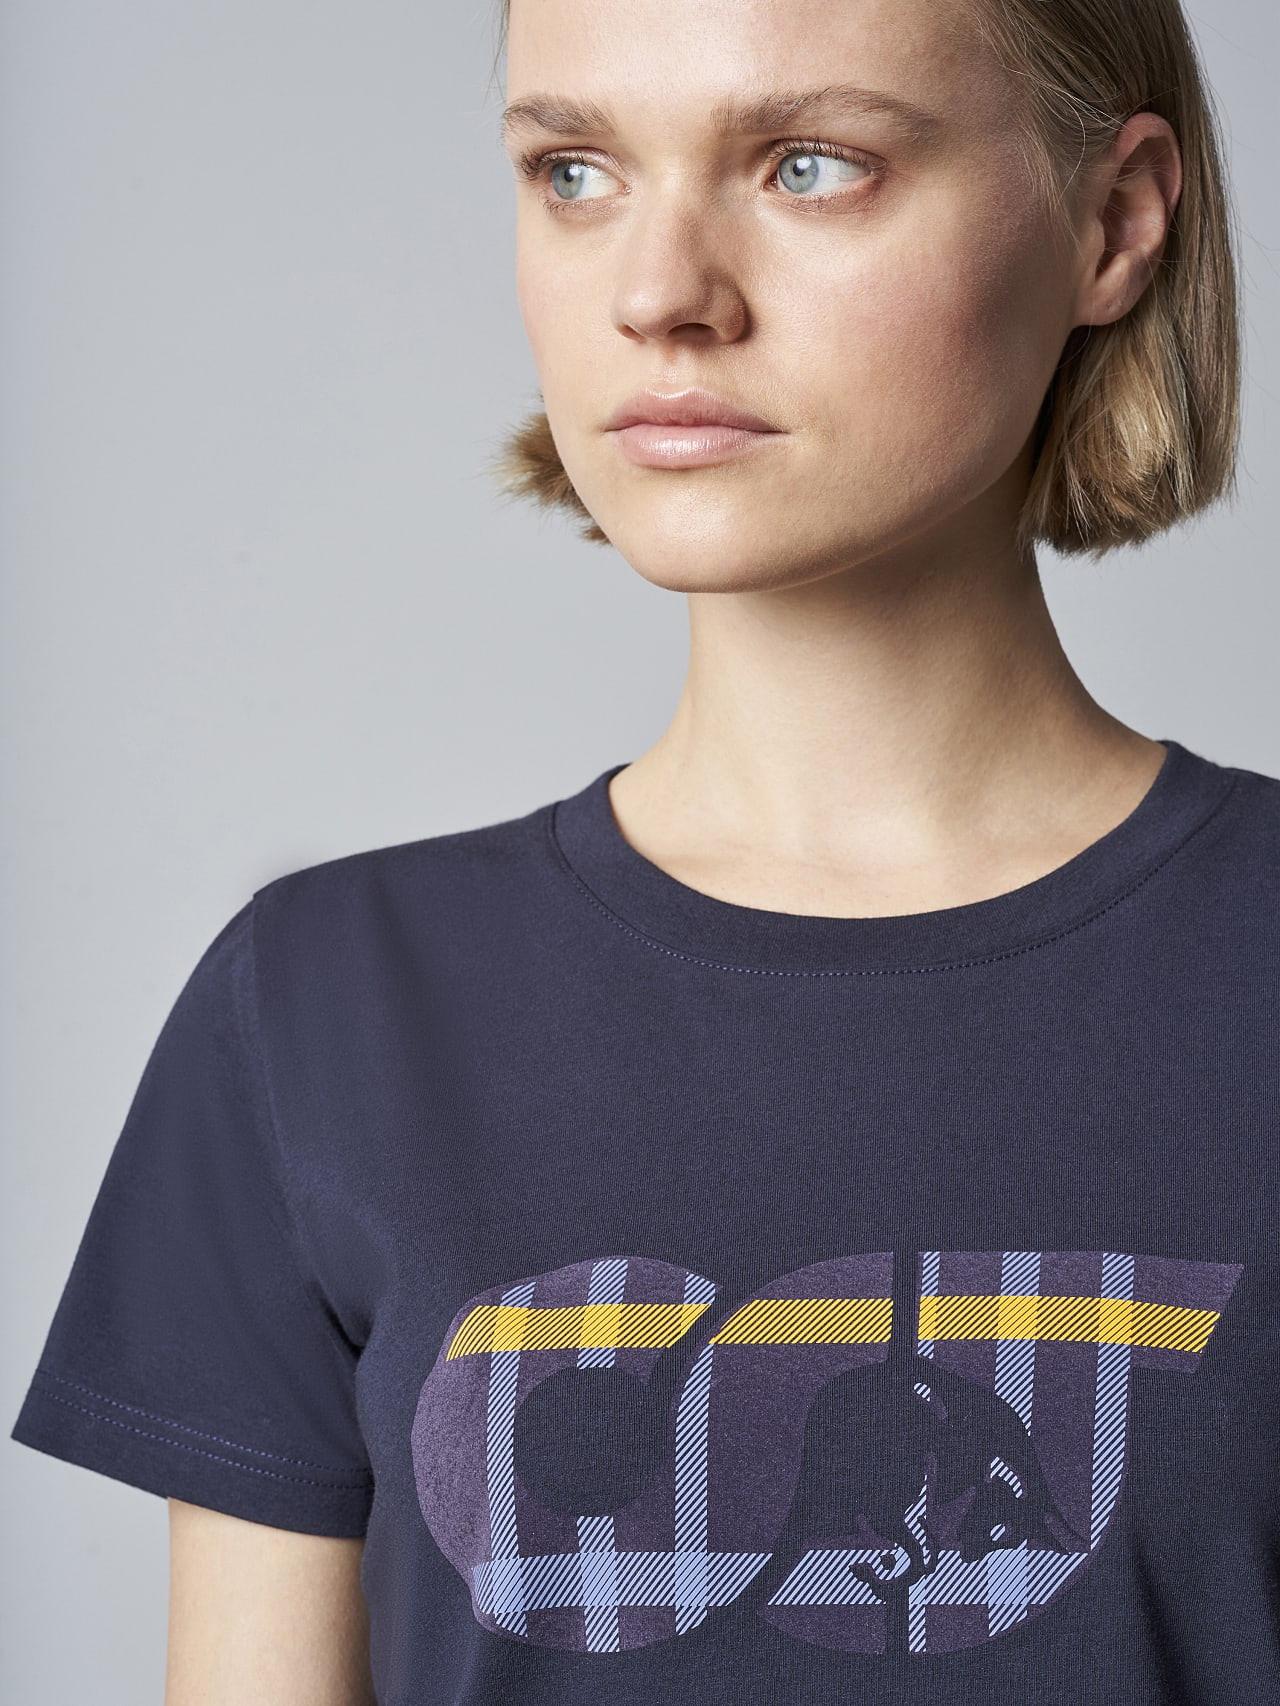 JANPA V1.Y5.02 Logo Print T-Shirt navy Right Alpha Tauri